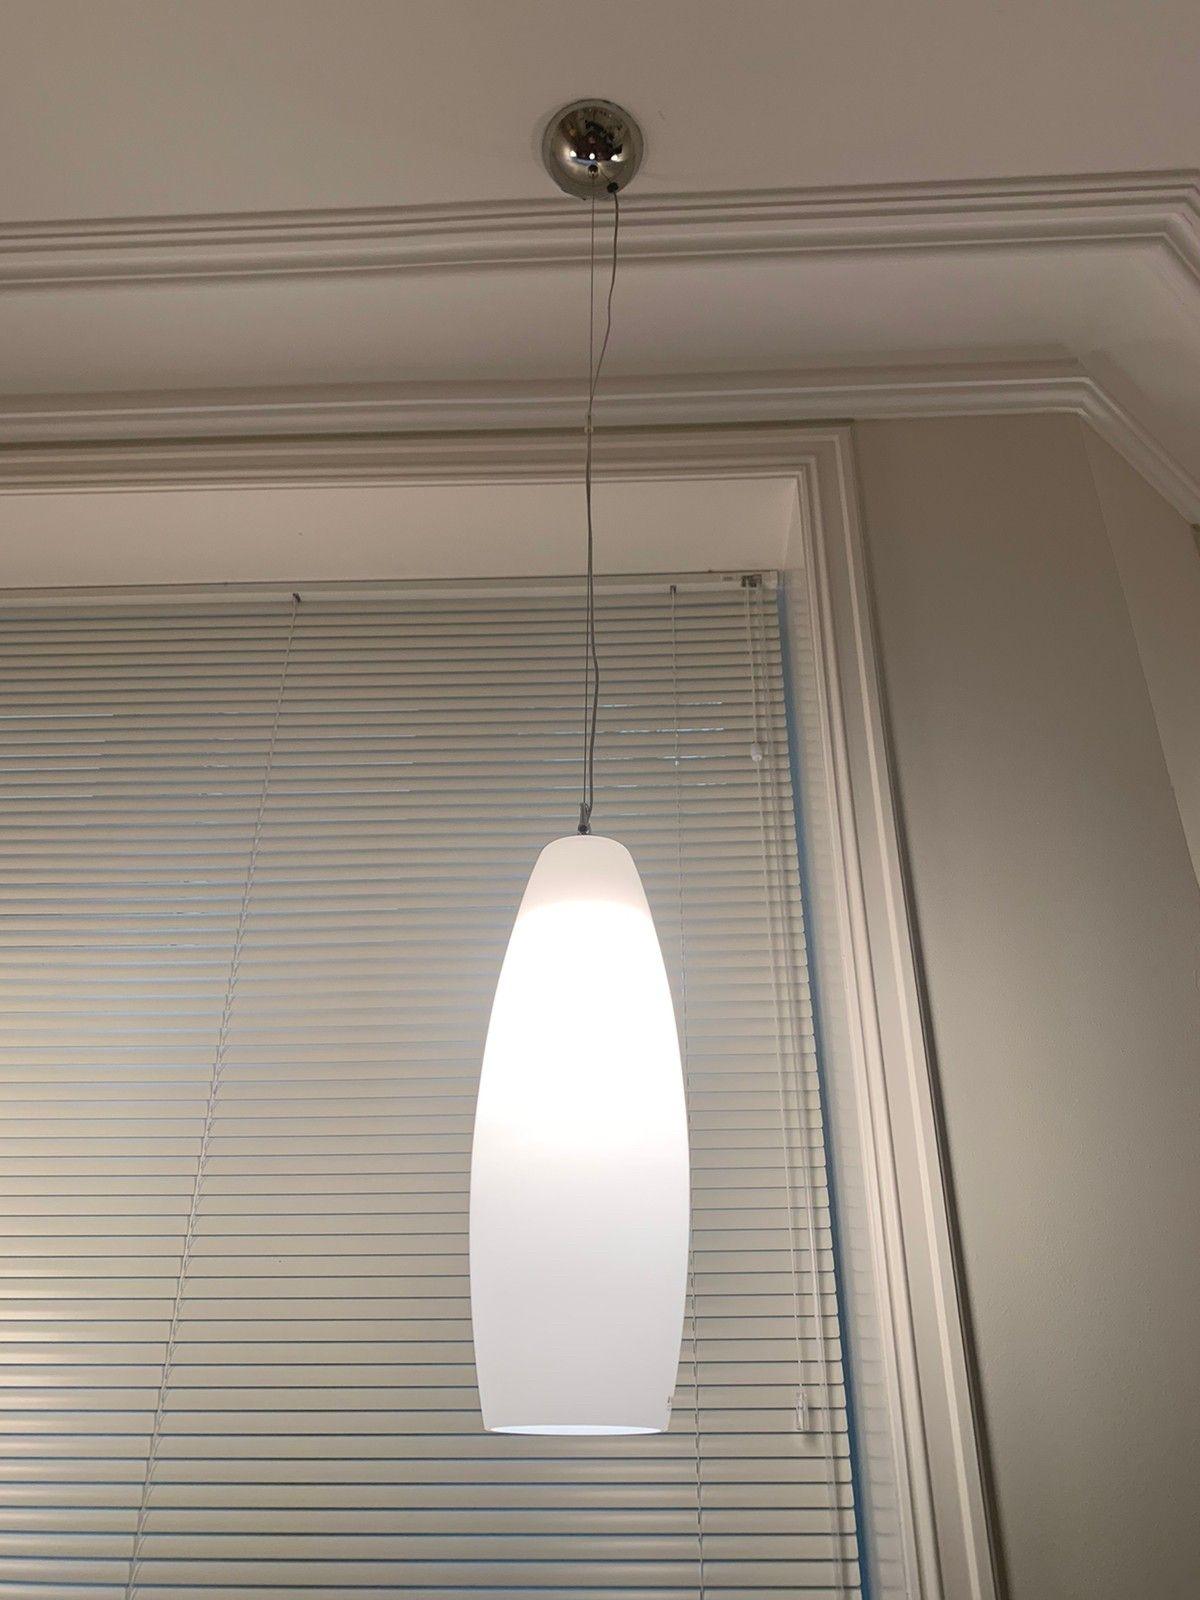 2 stk glass italiensk design lamper pendant fra RUGGIU